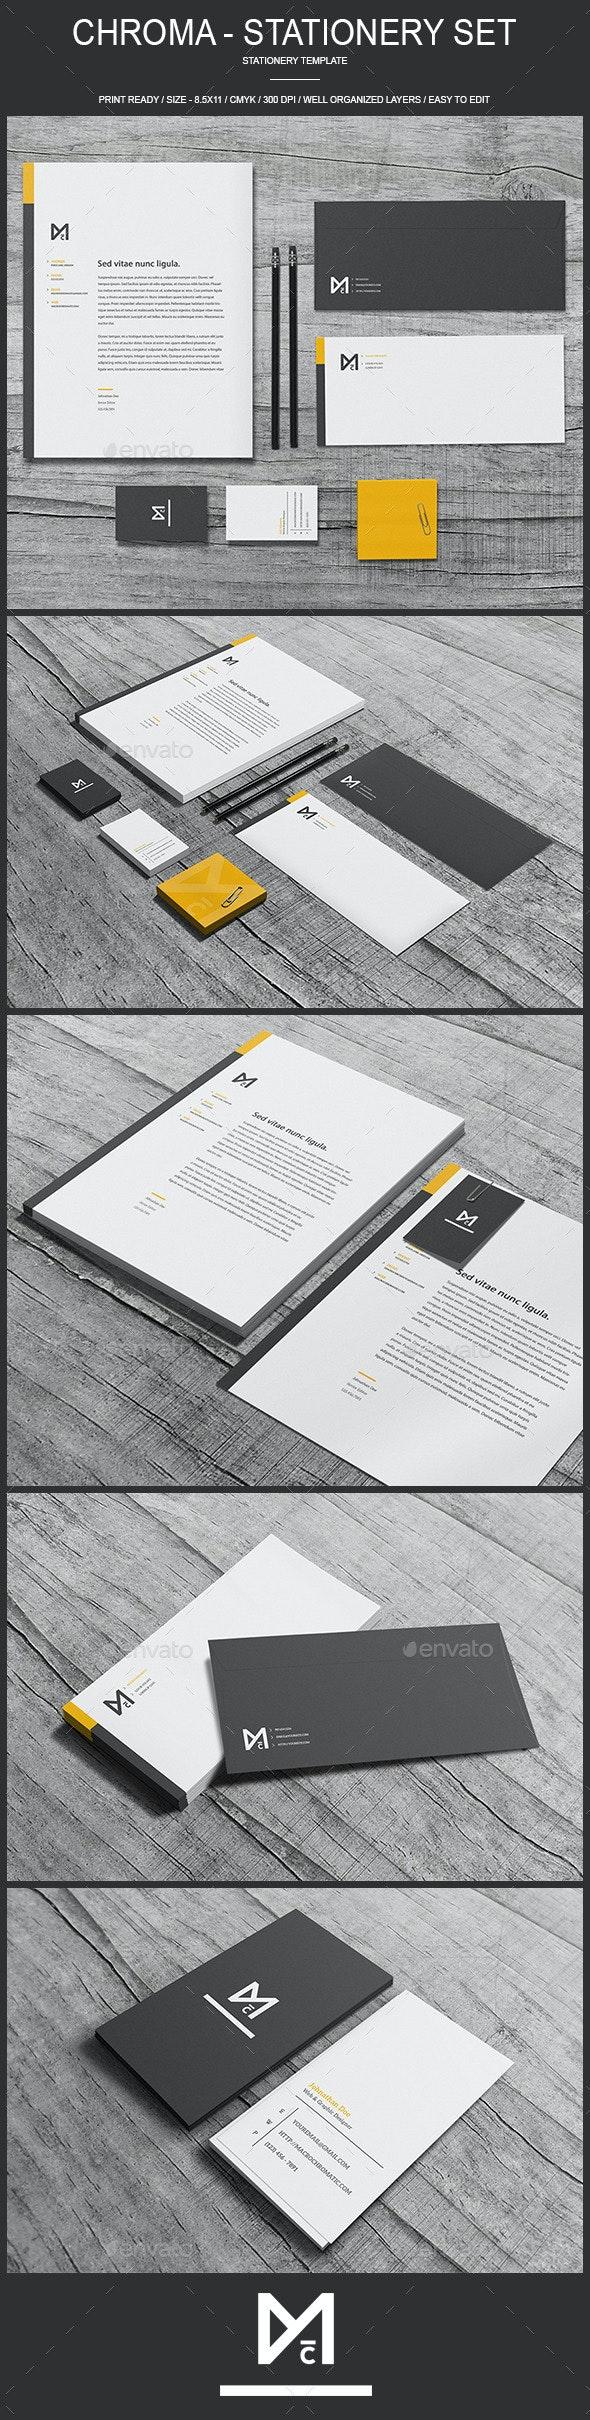 Chroma - Stationery Template - Stationery Print Templates